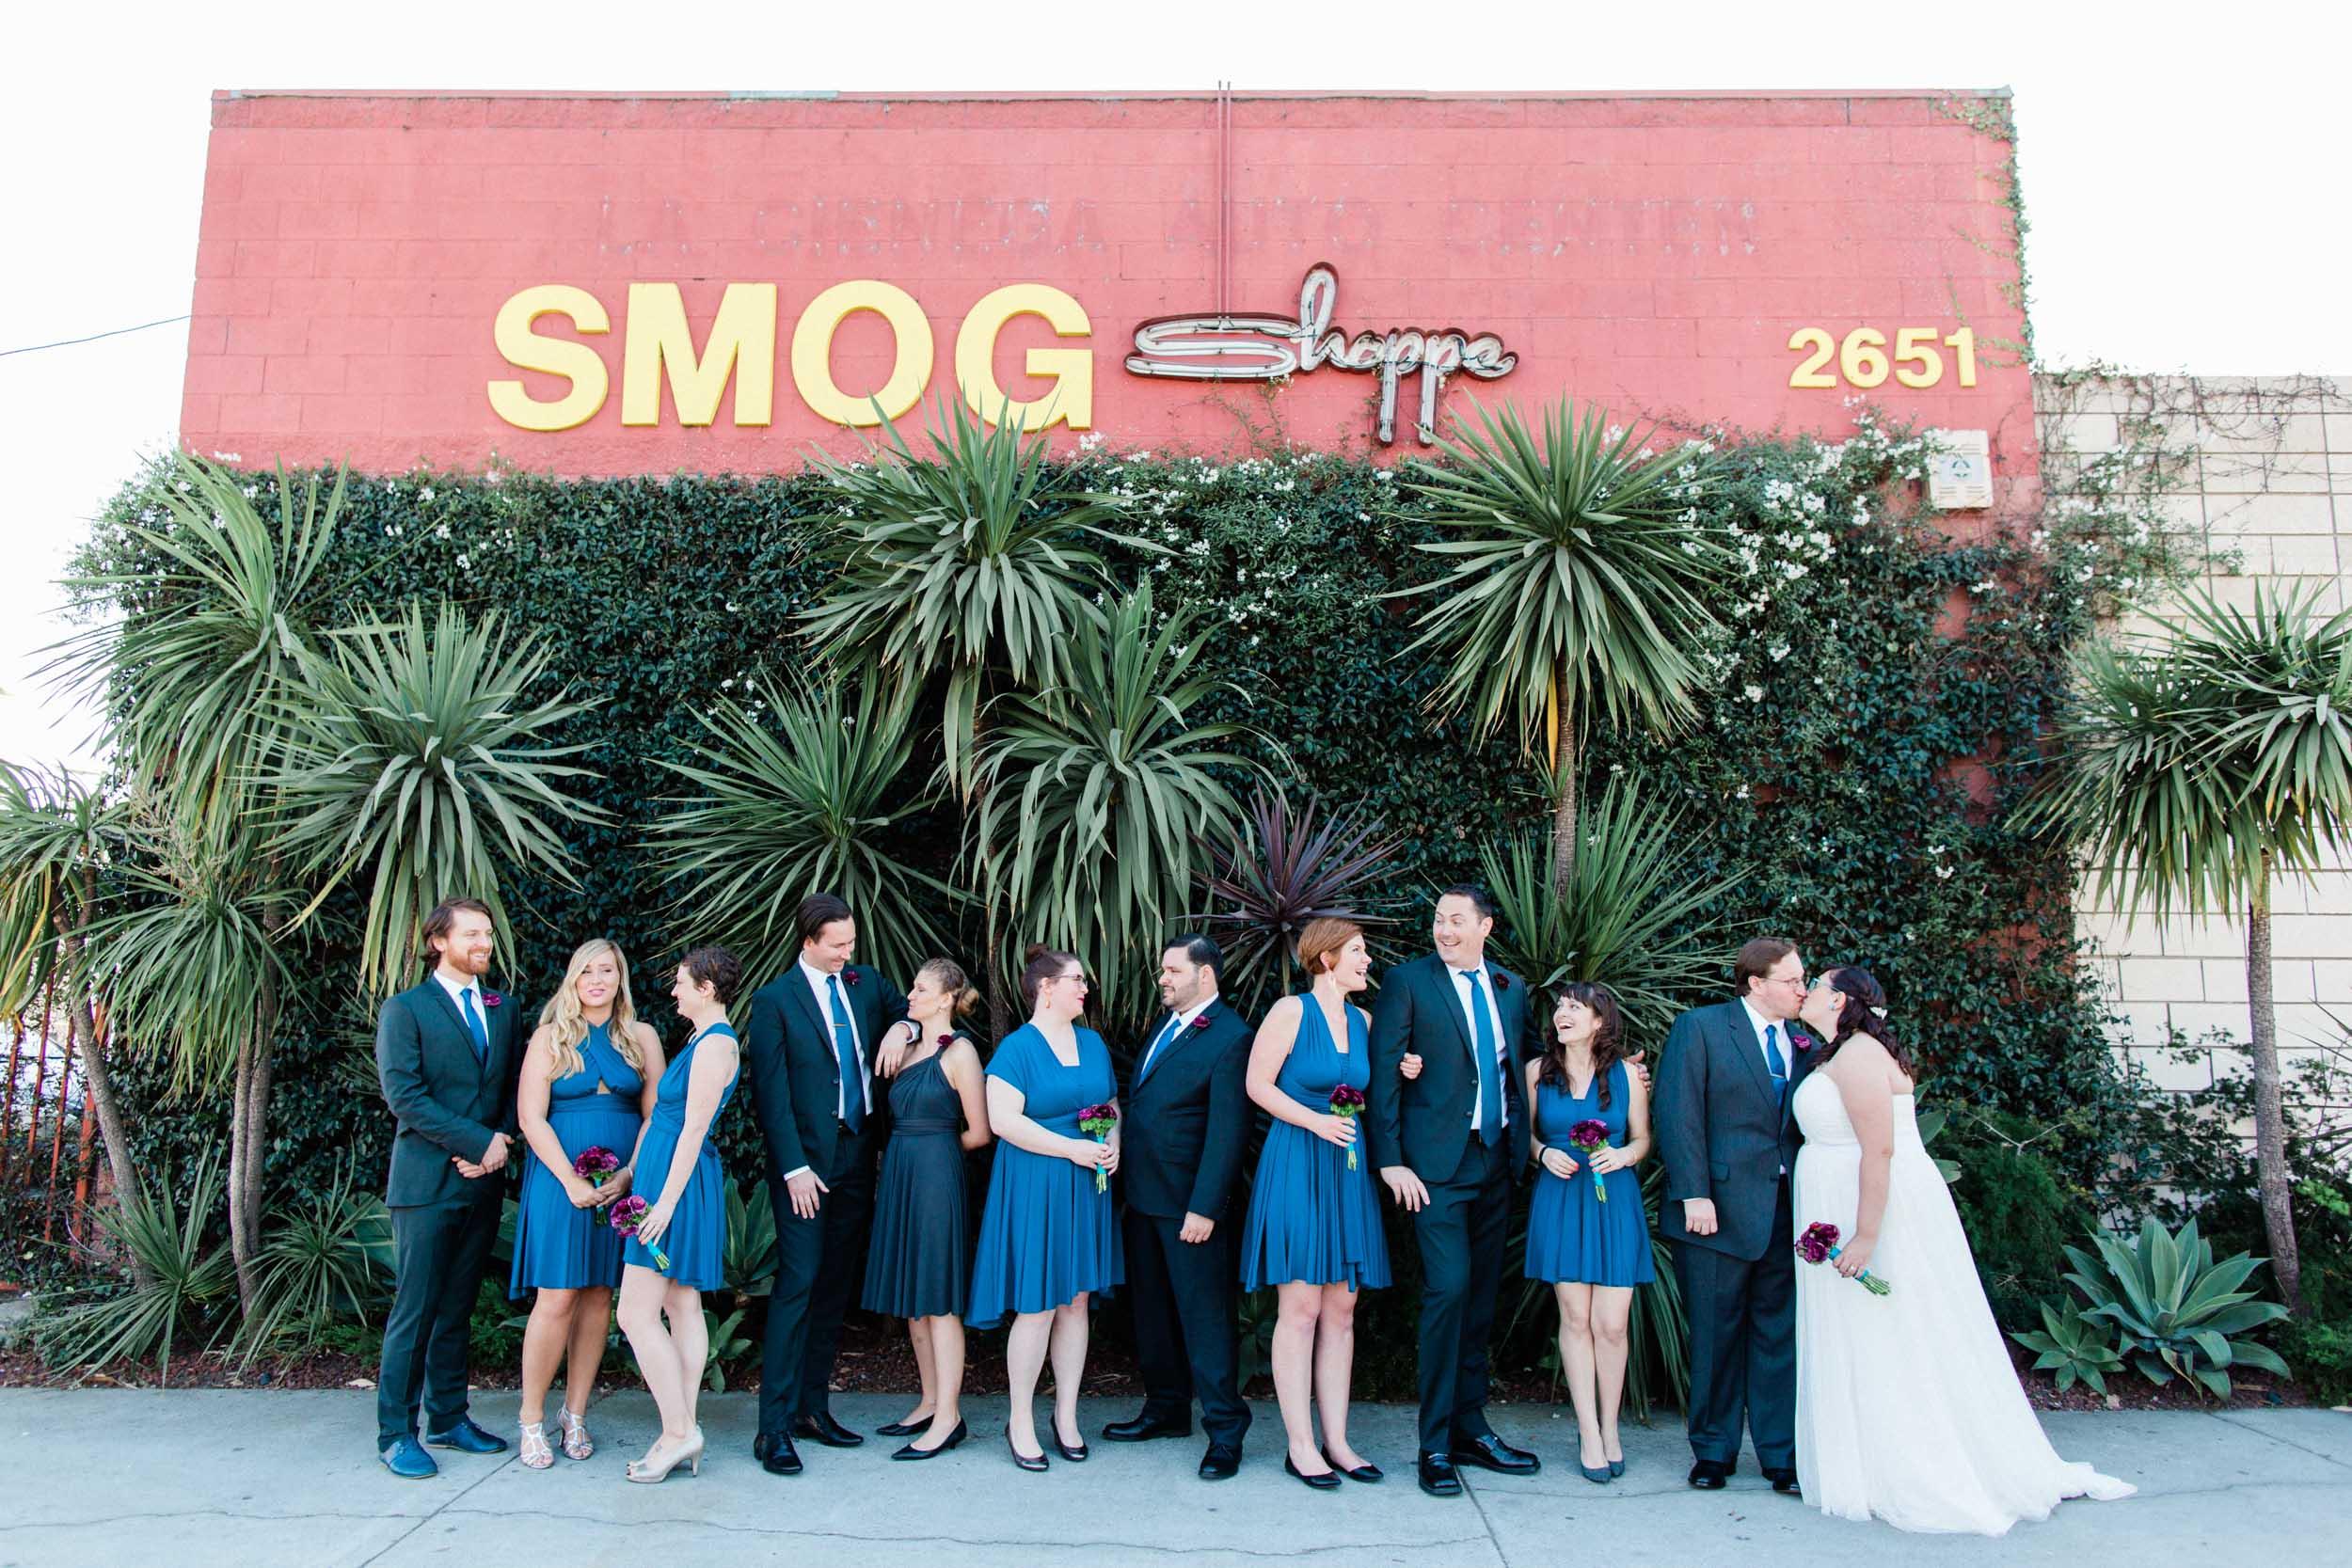 BKM-Photography-Smog-Shoppe-Culver-City-Wedding-Photographer-Culver-Hotel-0029.jpg